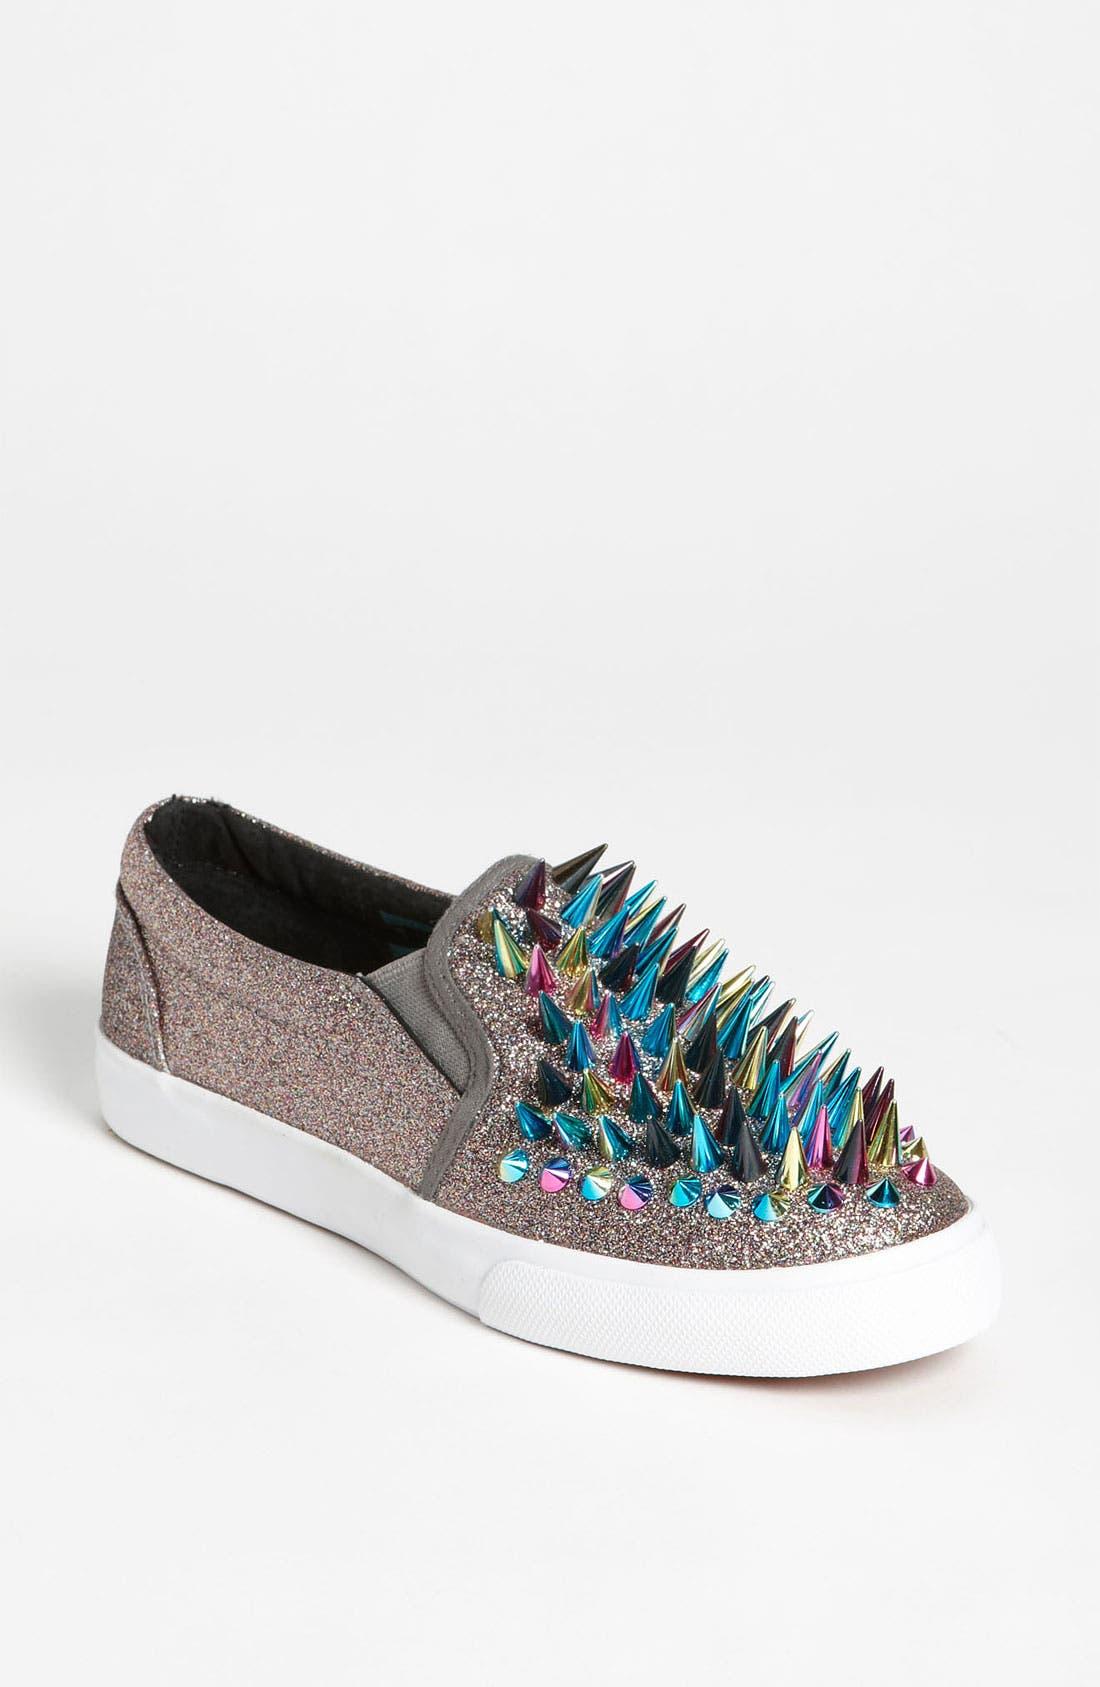 Alternate Image 1 Selected - Jeffrey Campbell 'Scrape' Sneaker